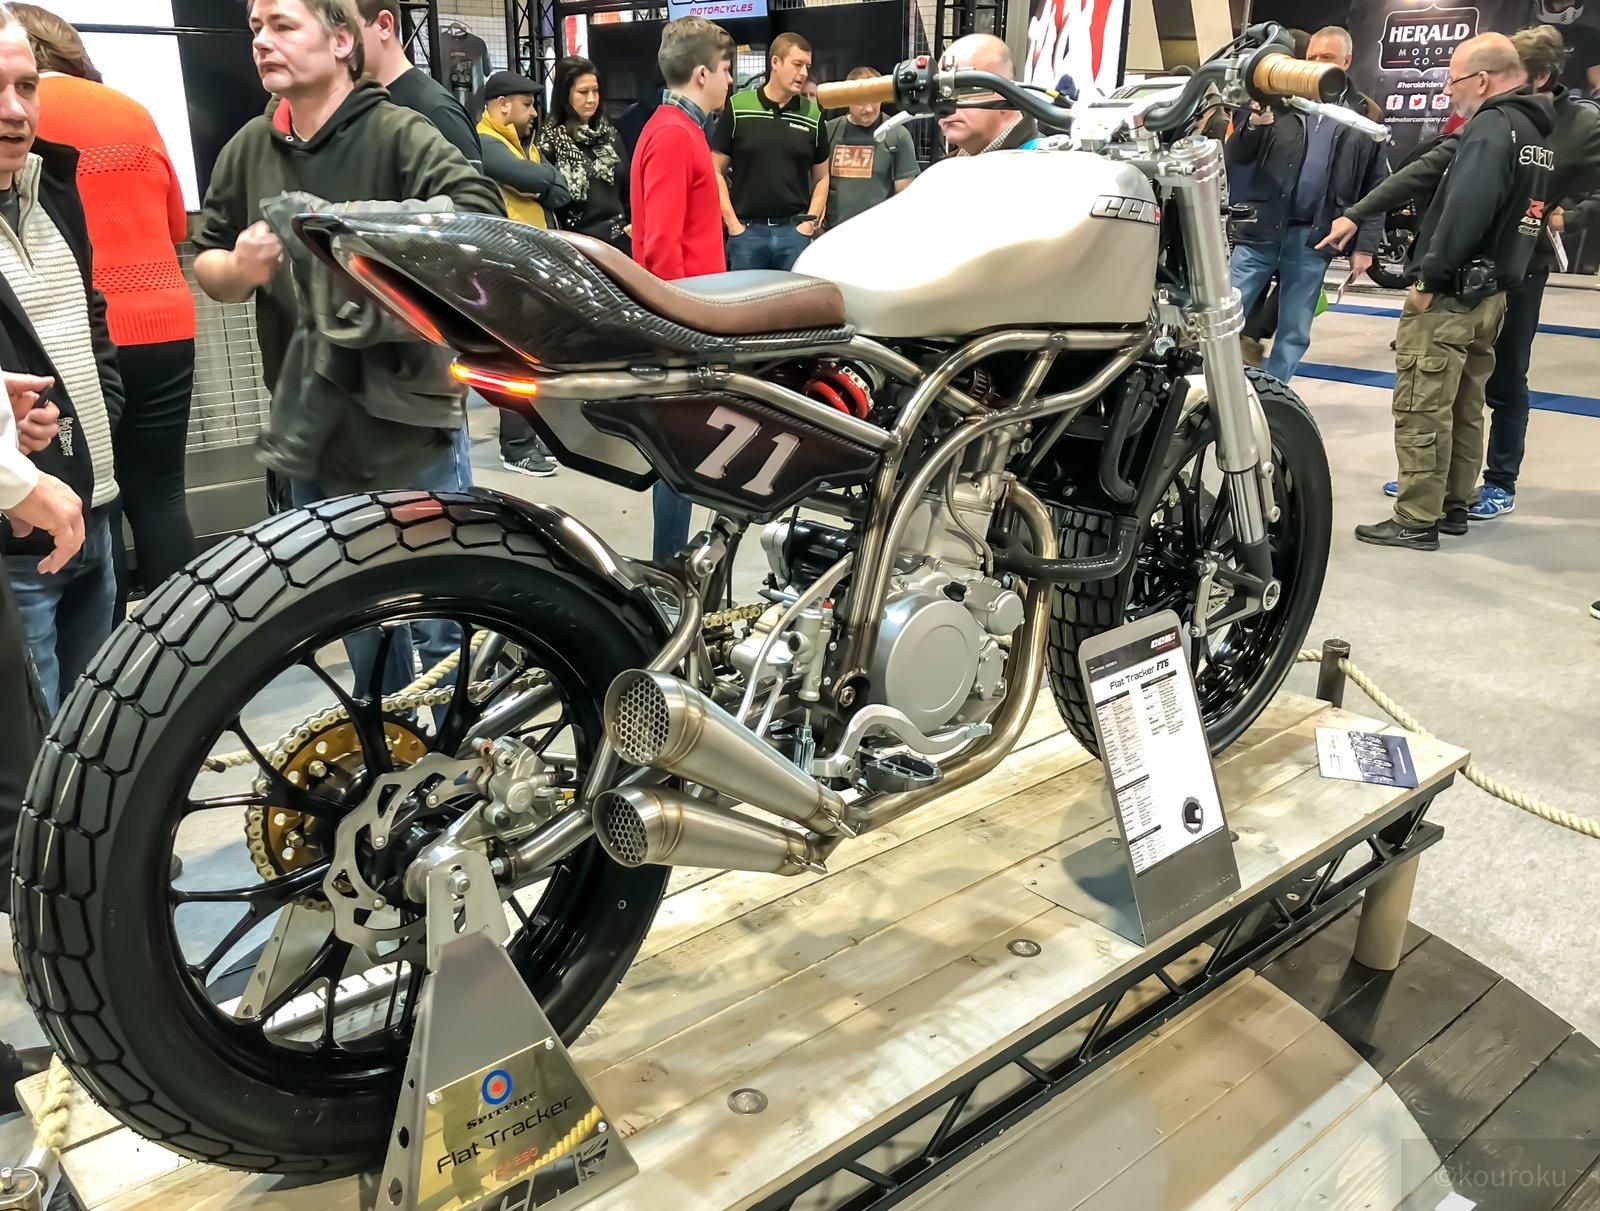 Ccm Flat Tracker | Ducati Forum